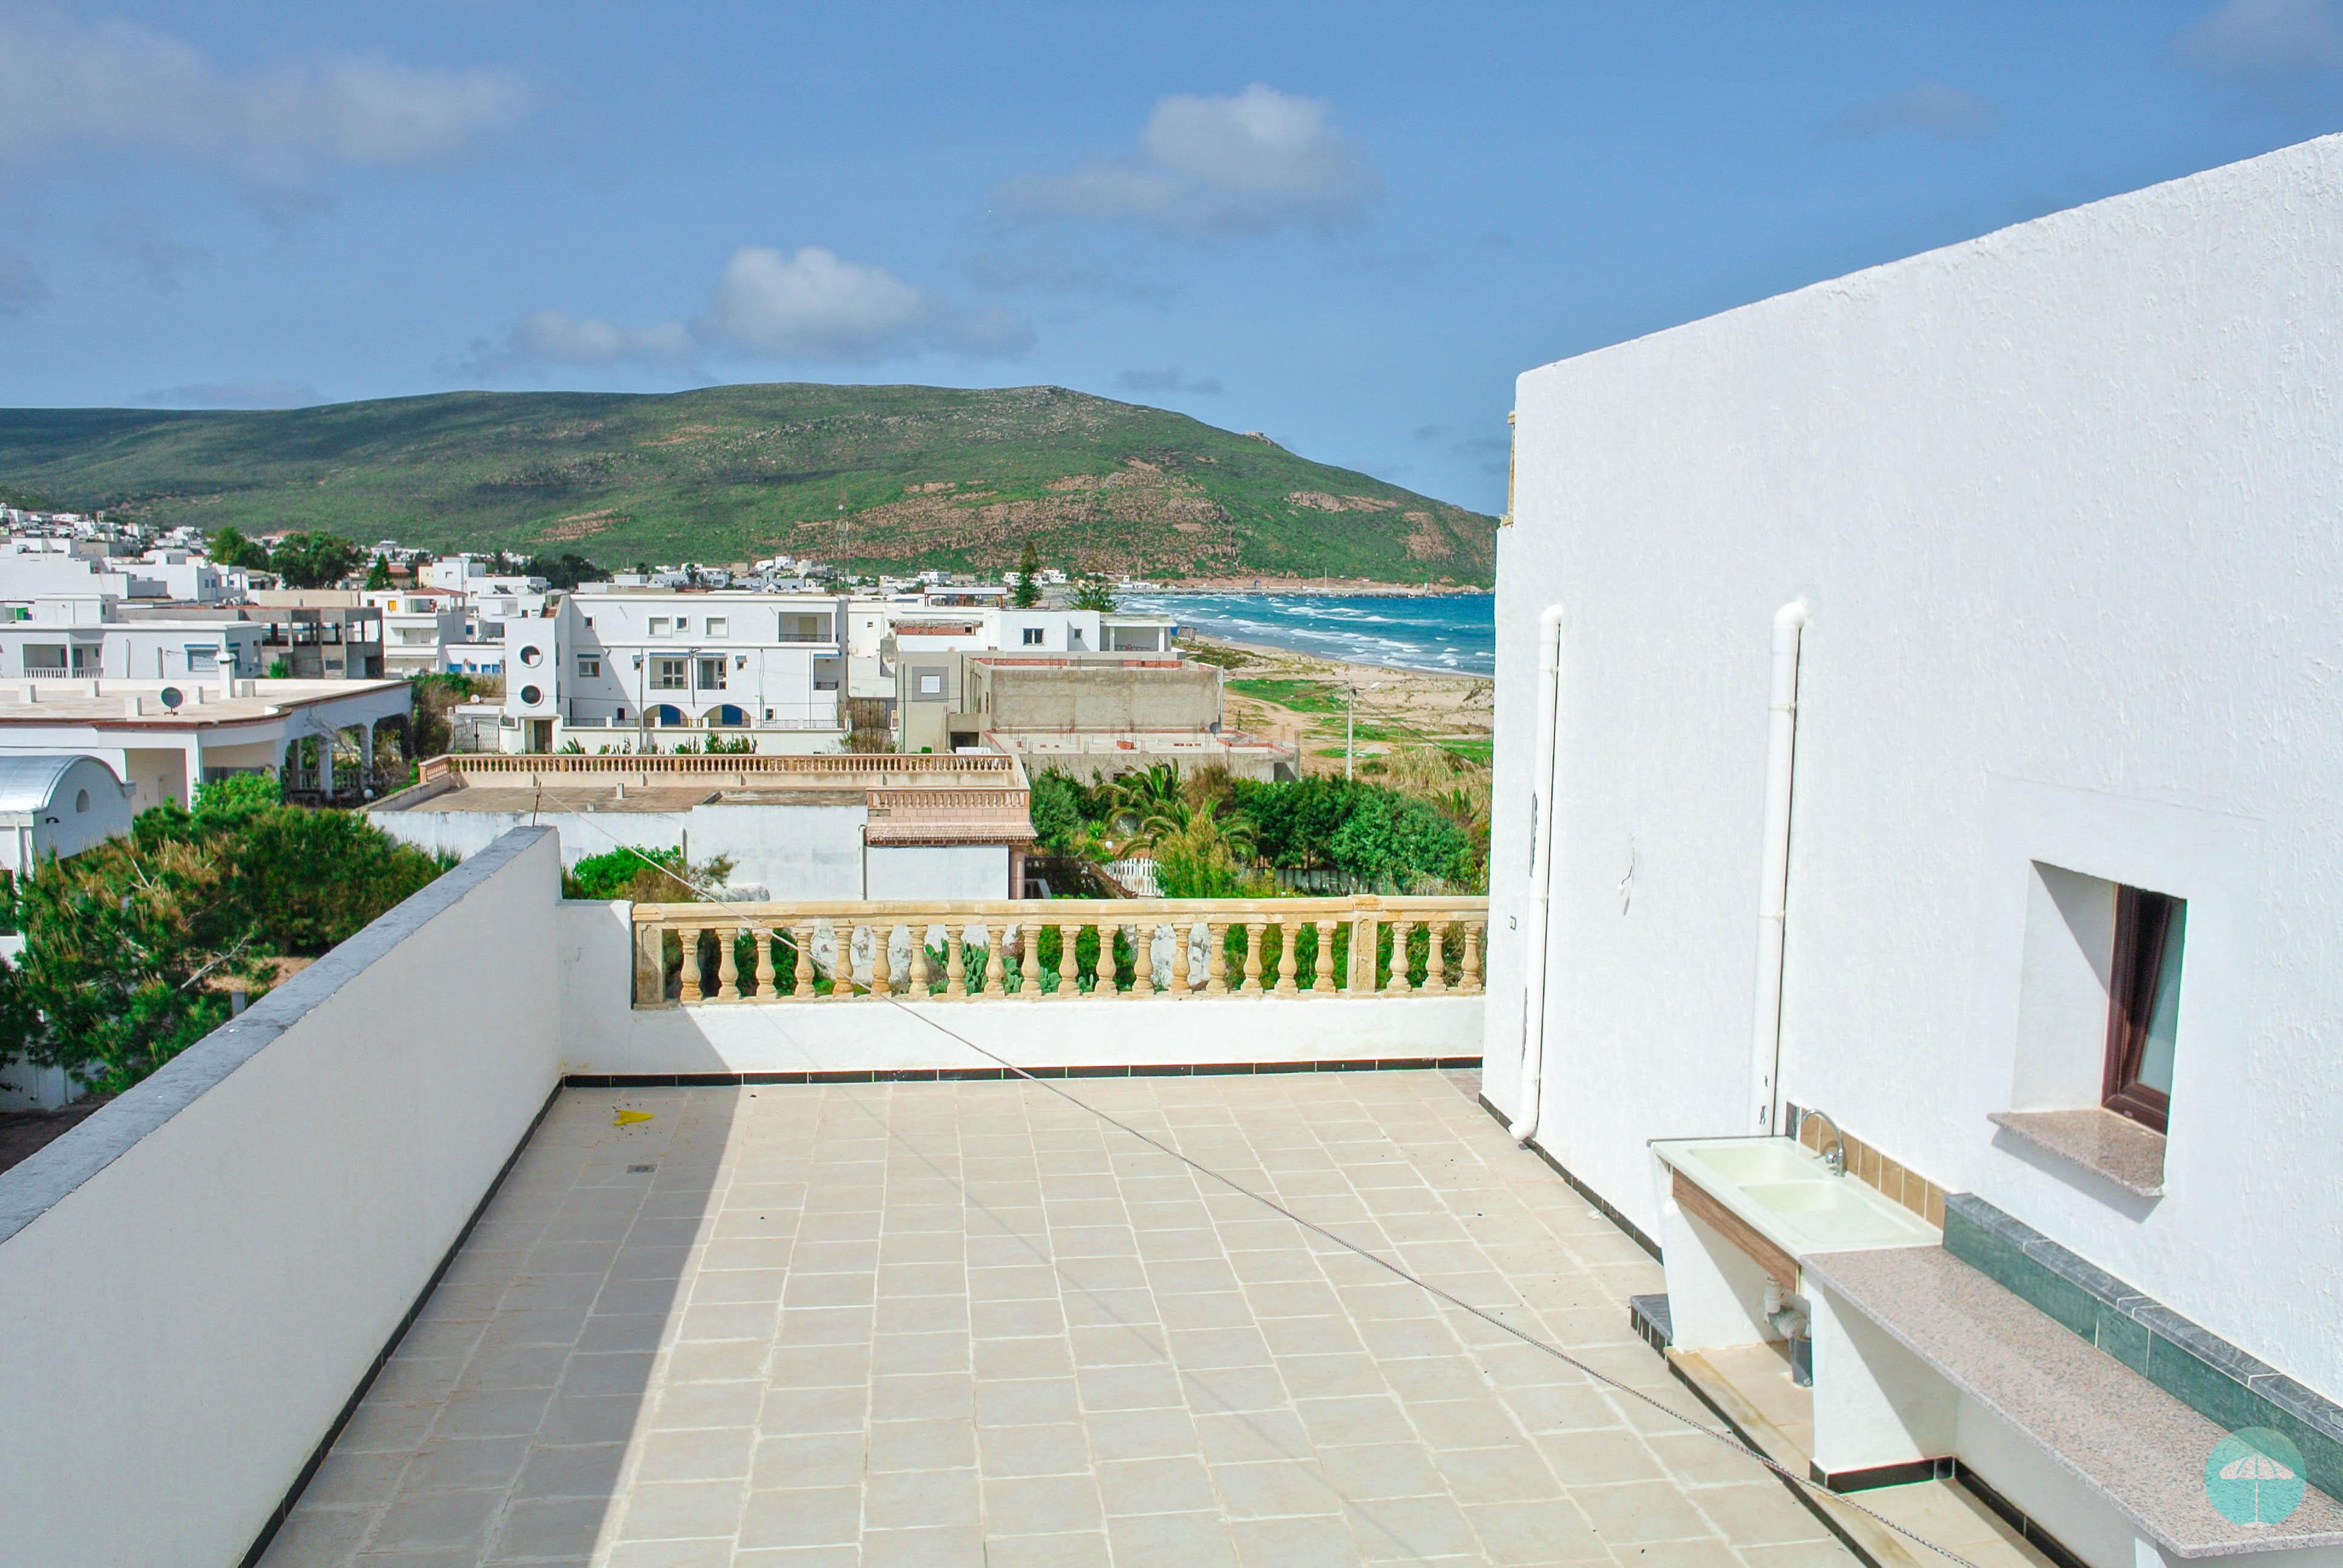 Location vacances kelibia